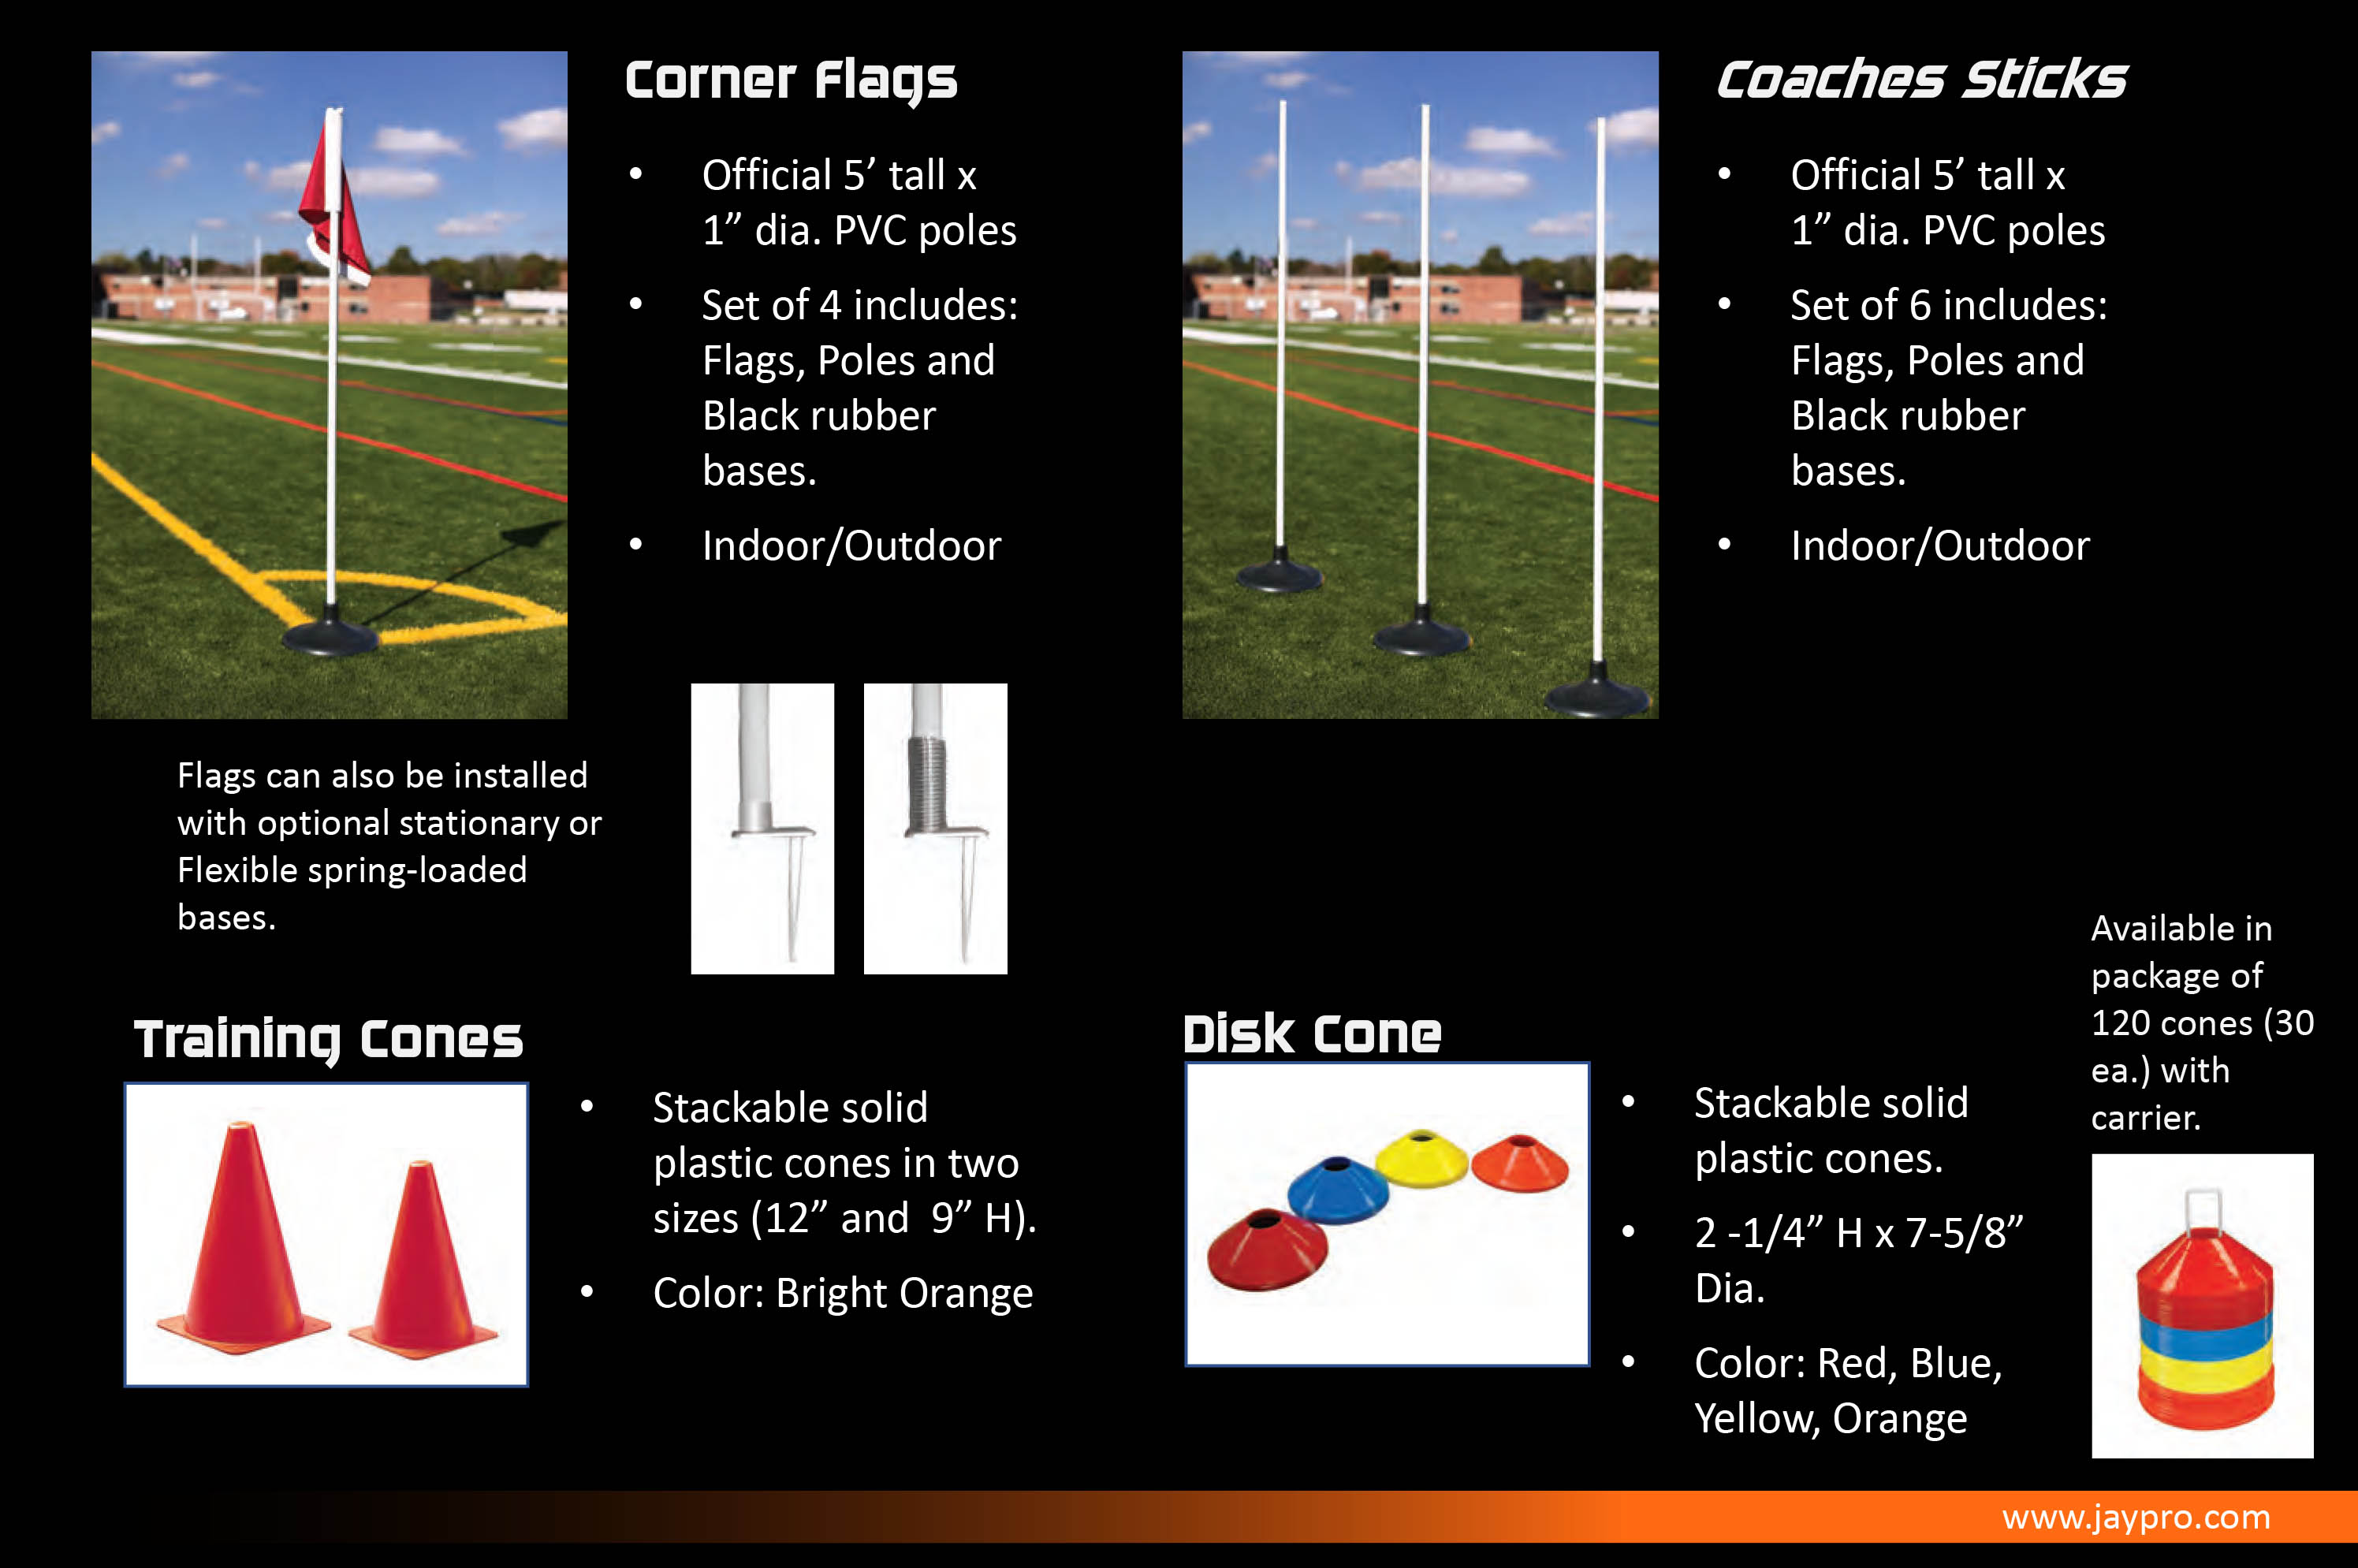 Jaypro Sports Field Accessories header image